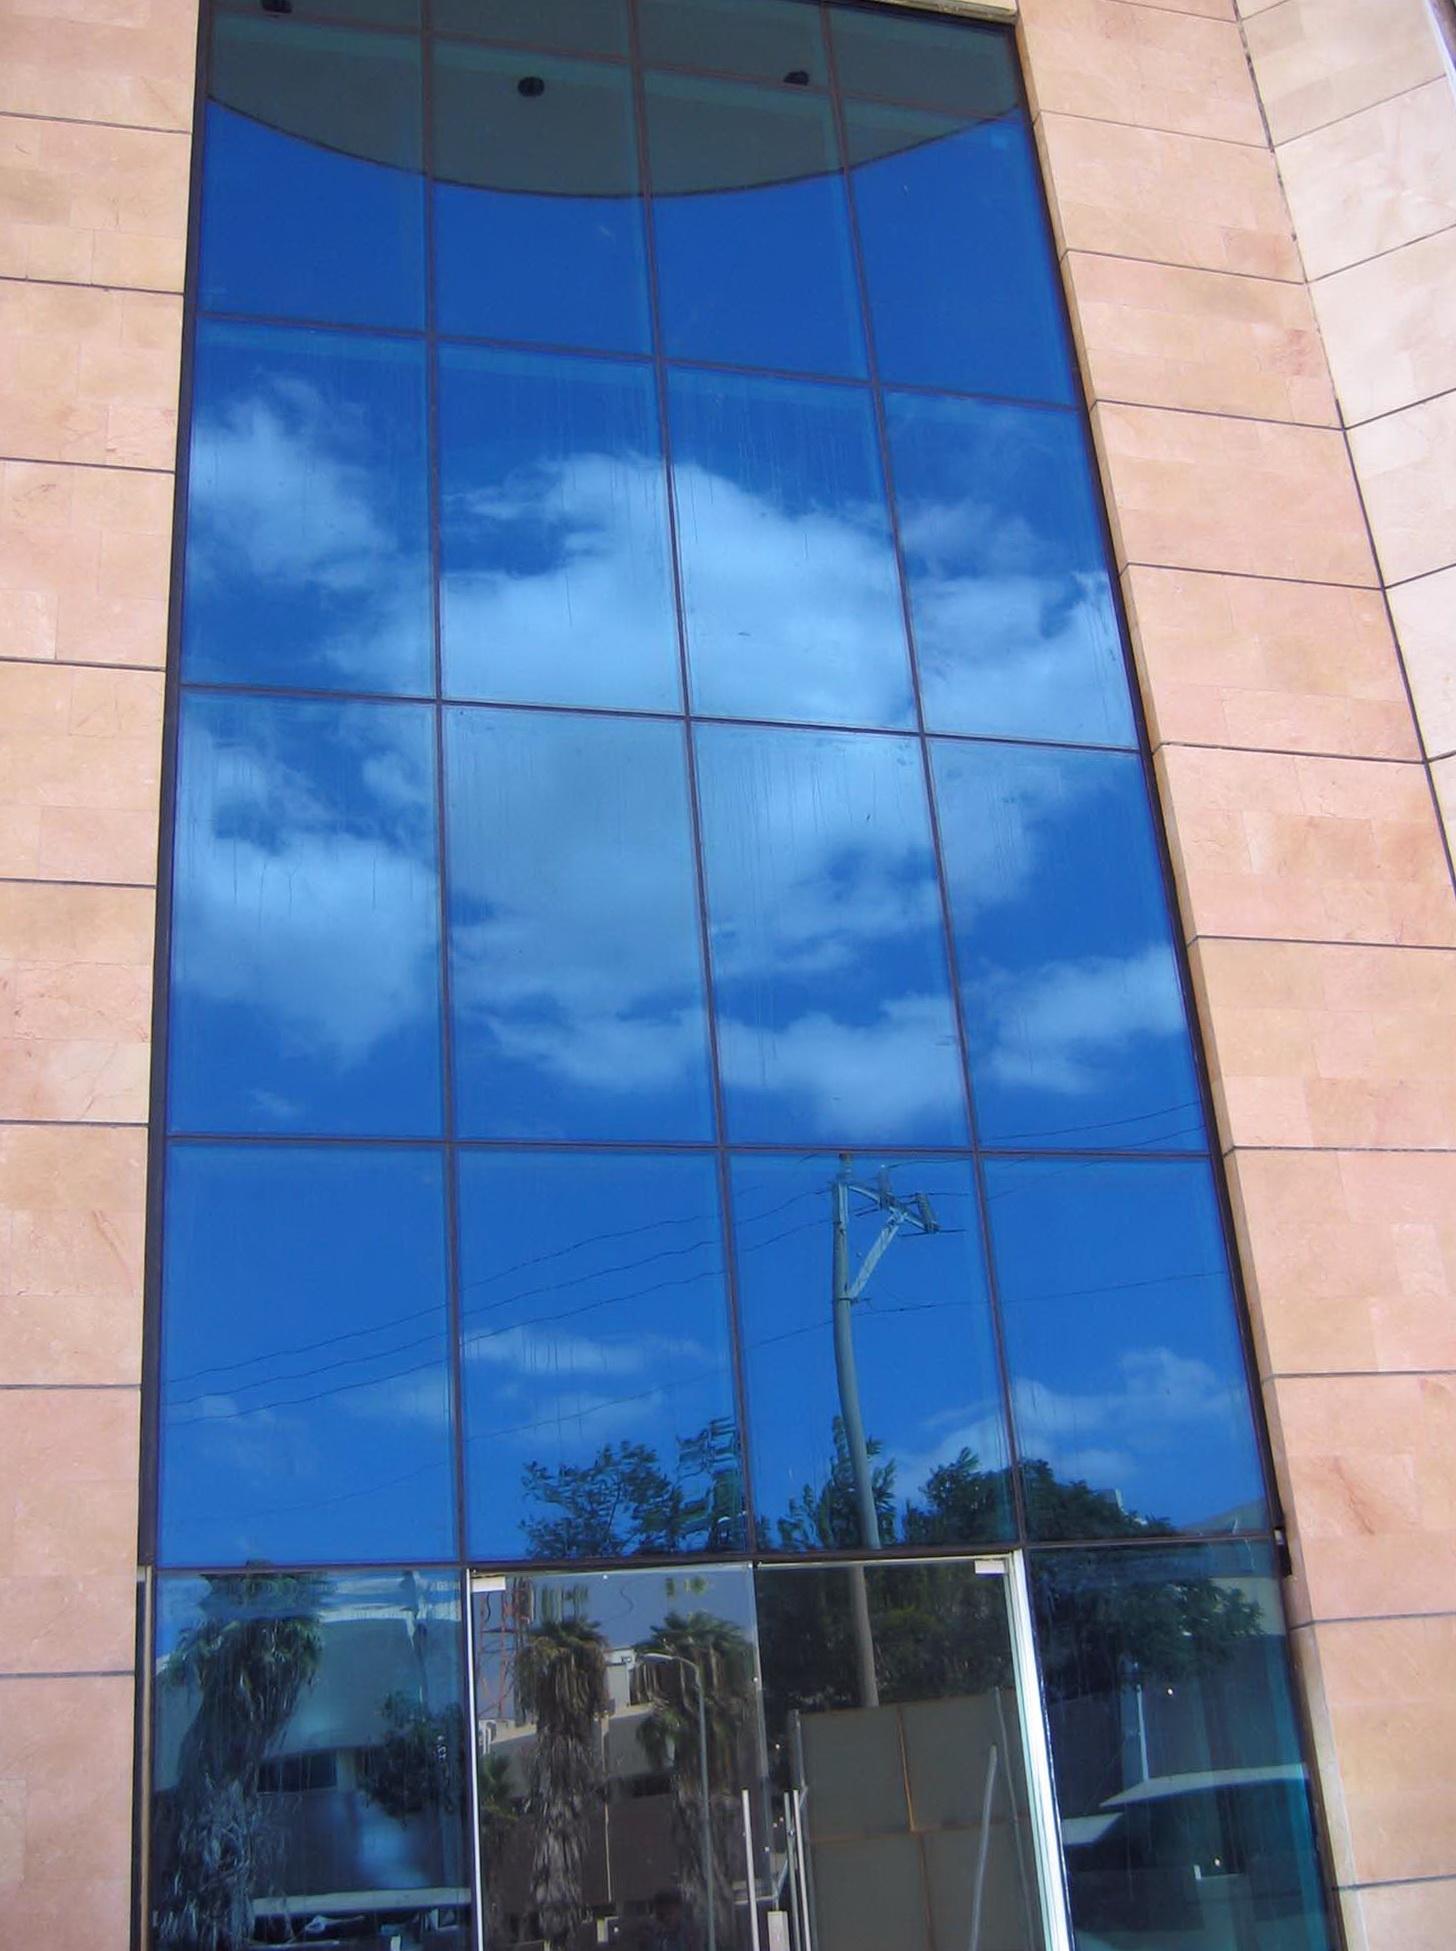 Glass Curtain Wall Facade Home Design Ideas